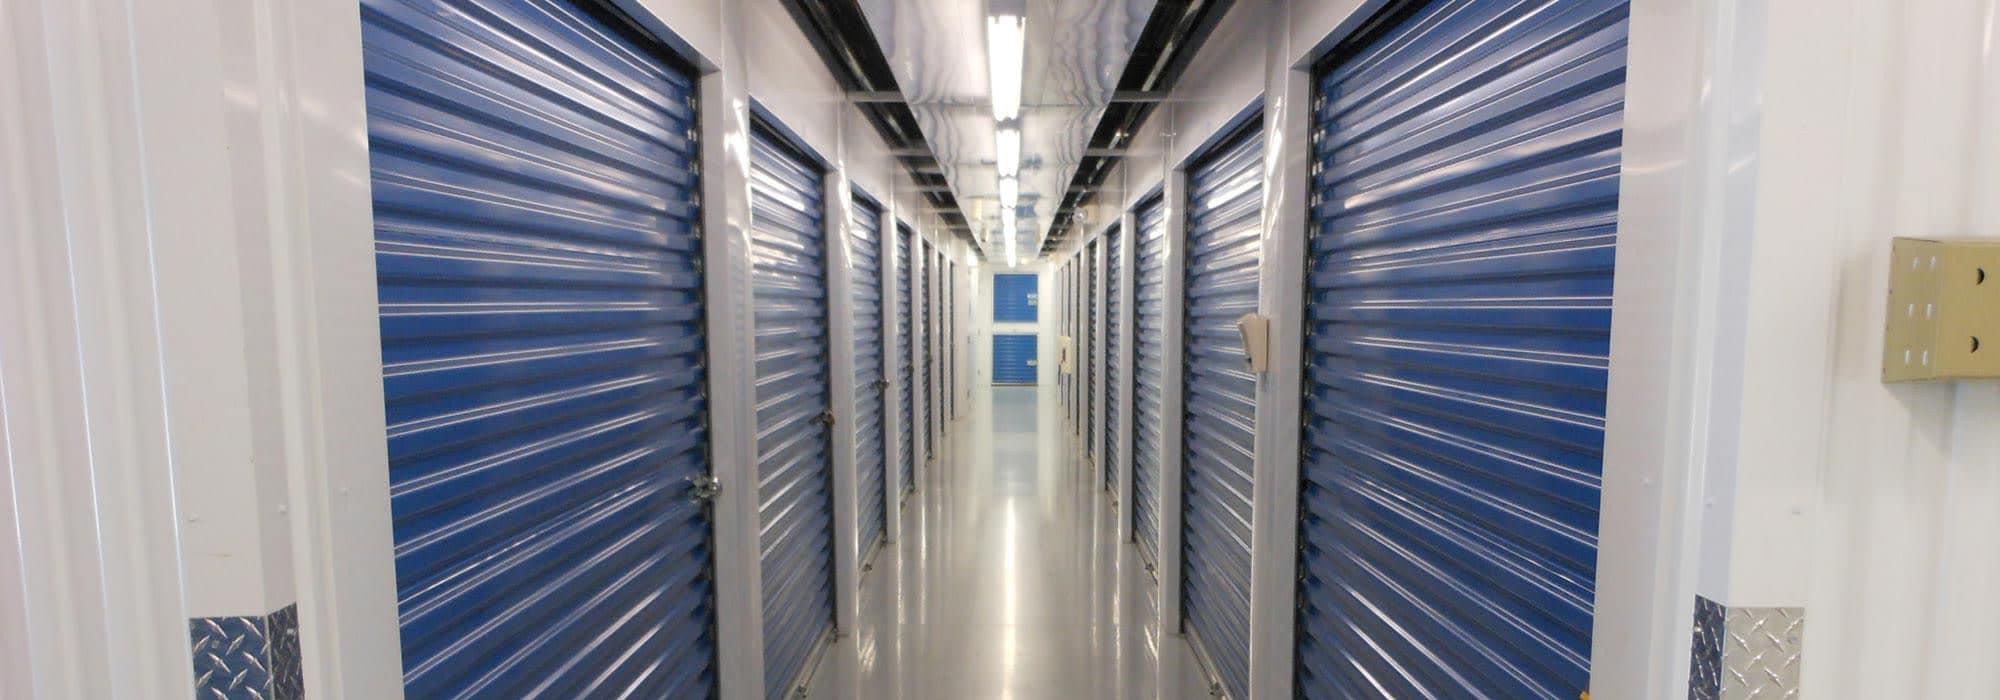 Self storage in McDonough GA